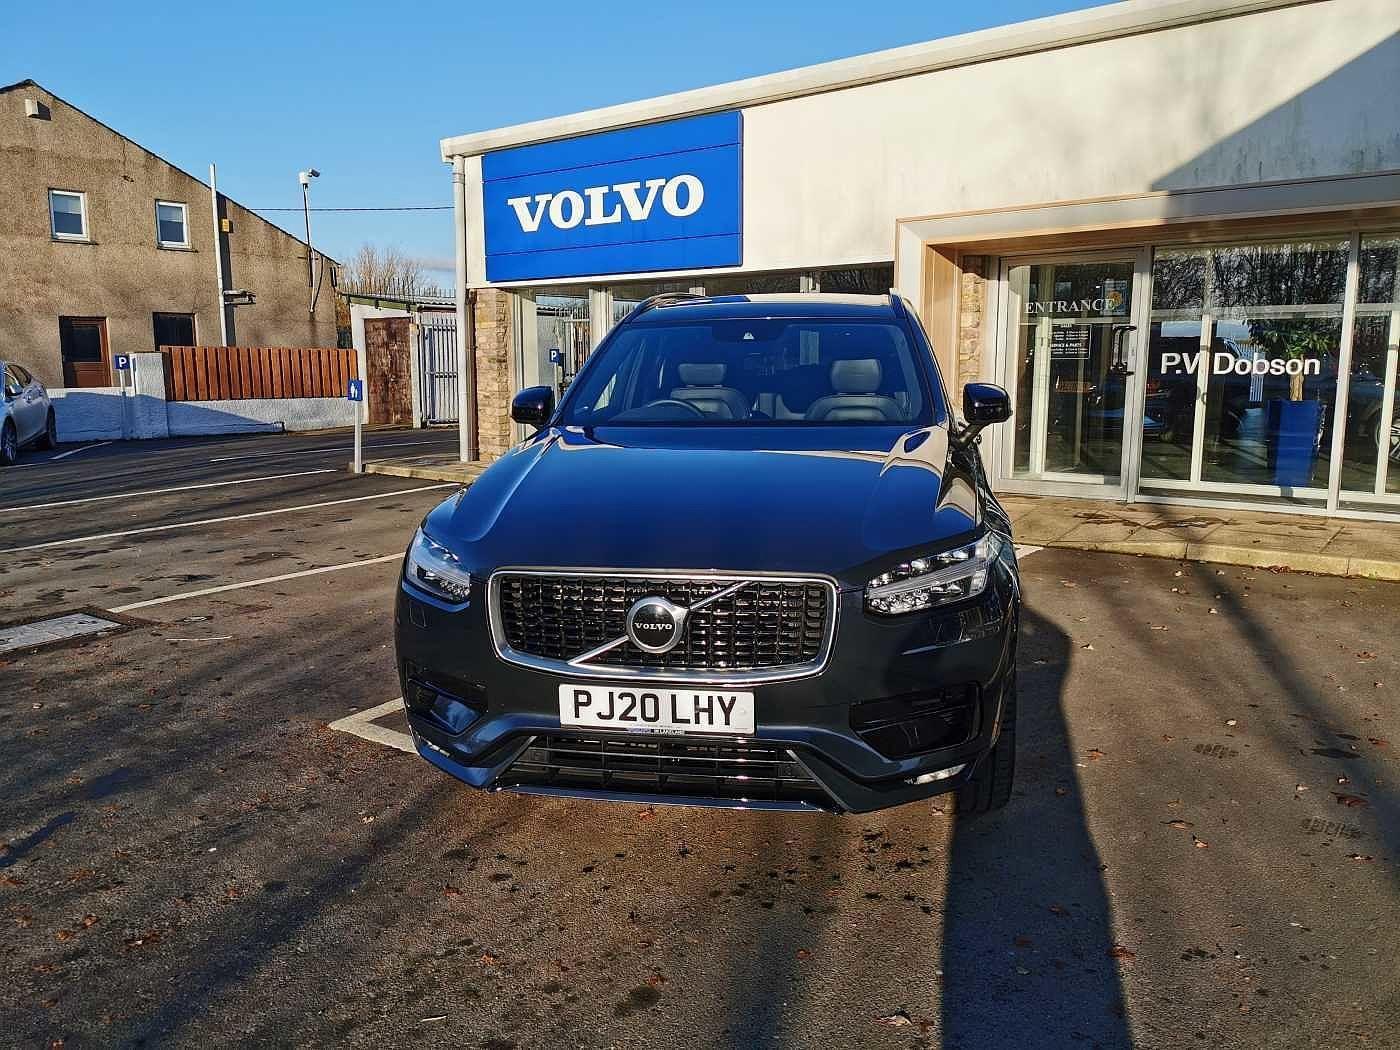 Volvo XC90 Estate 2.0TD B5 (235bhp) AWD R-Design